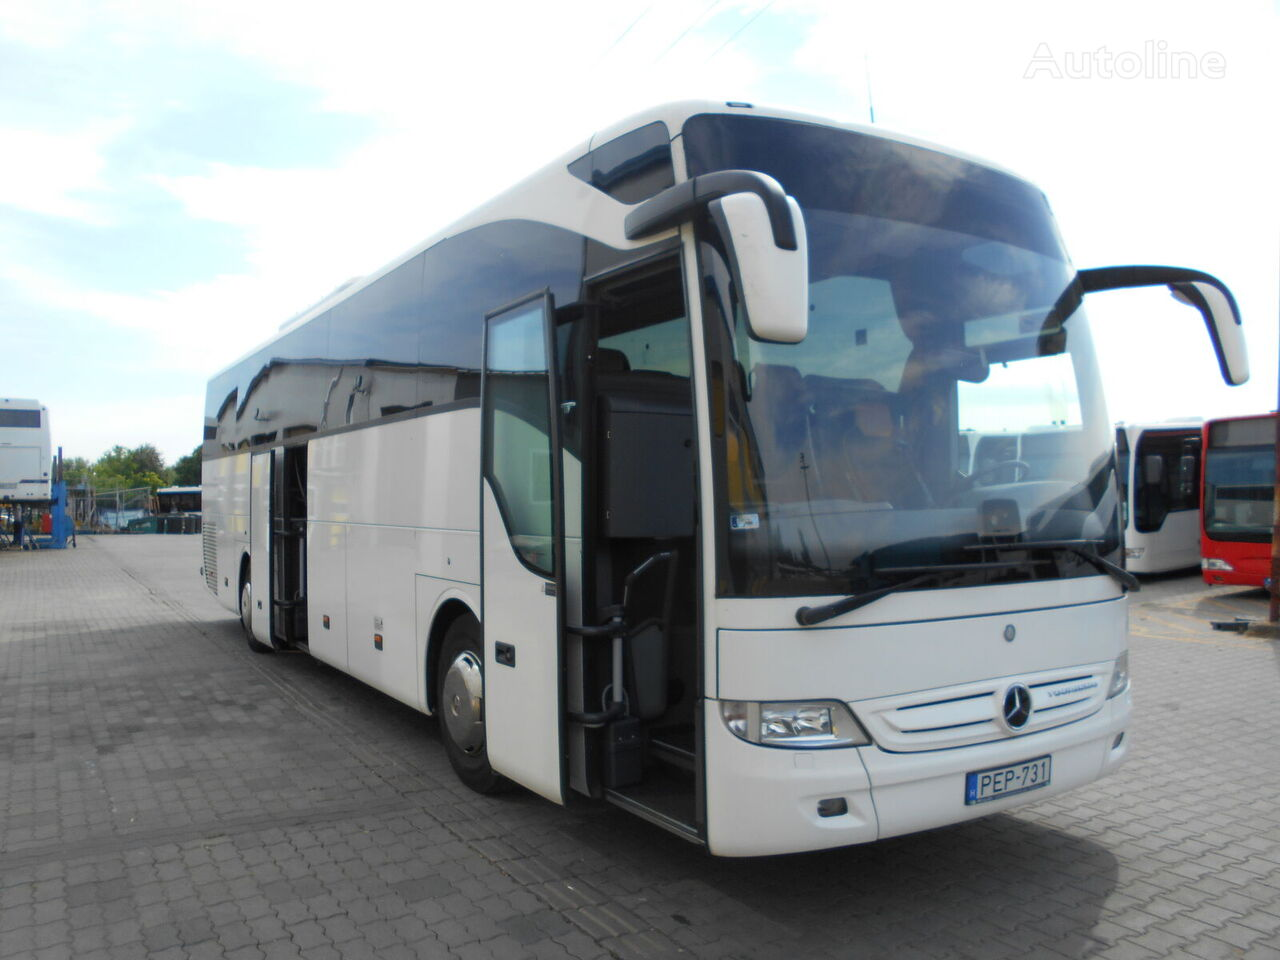 MERCEDES-BENZ Tourismo 15 RHD - Euro 6 - 3 db. interurban bus